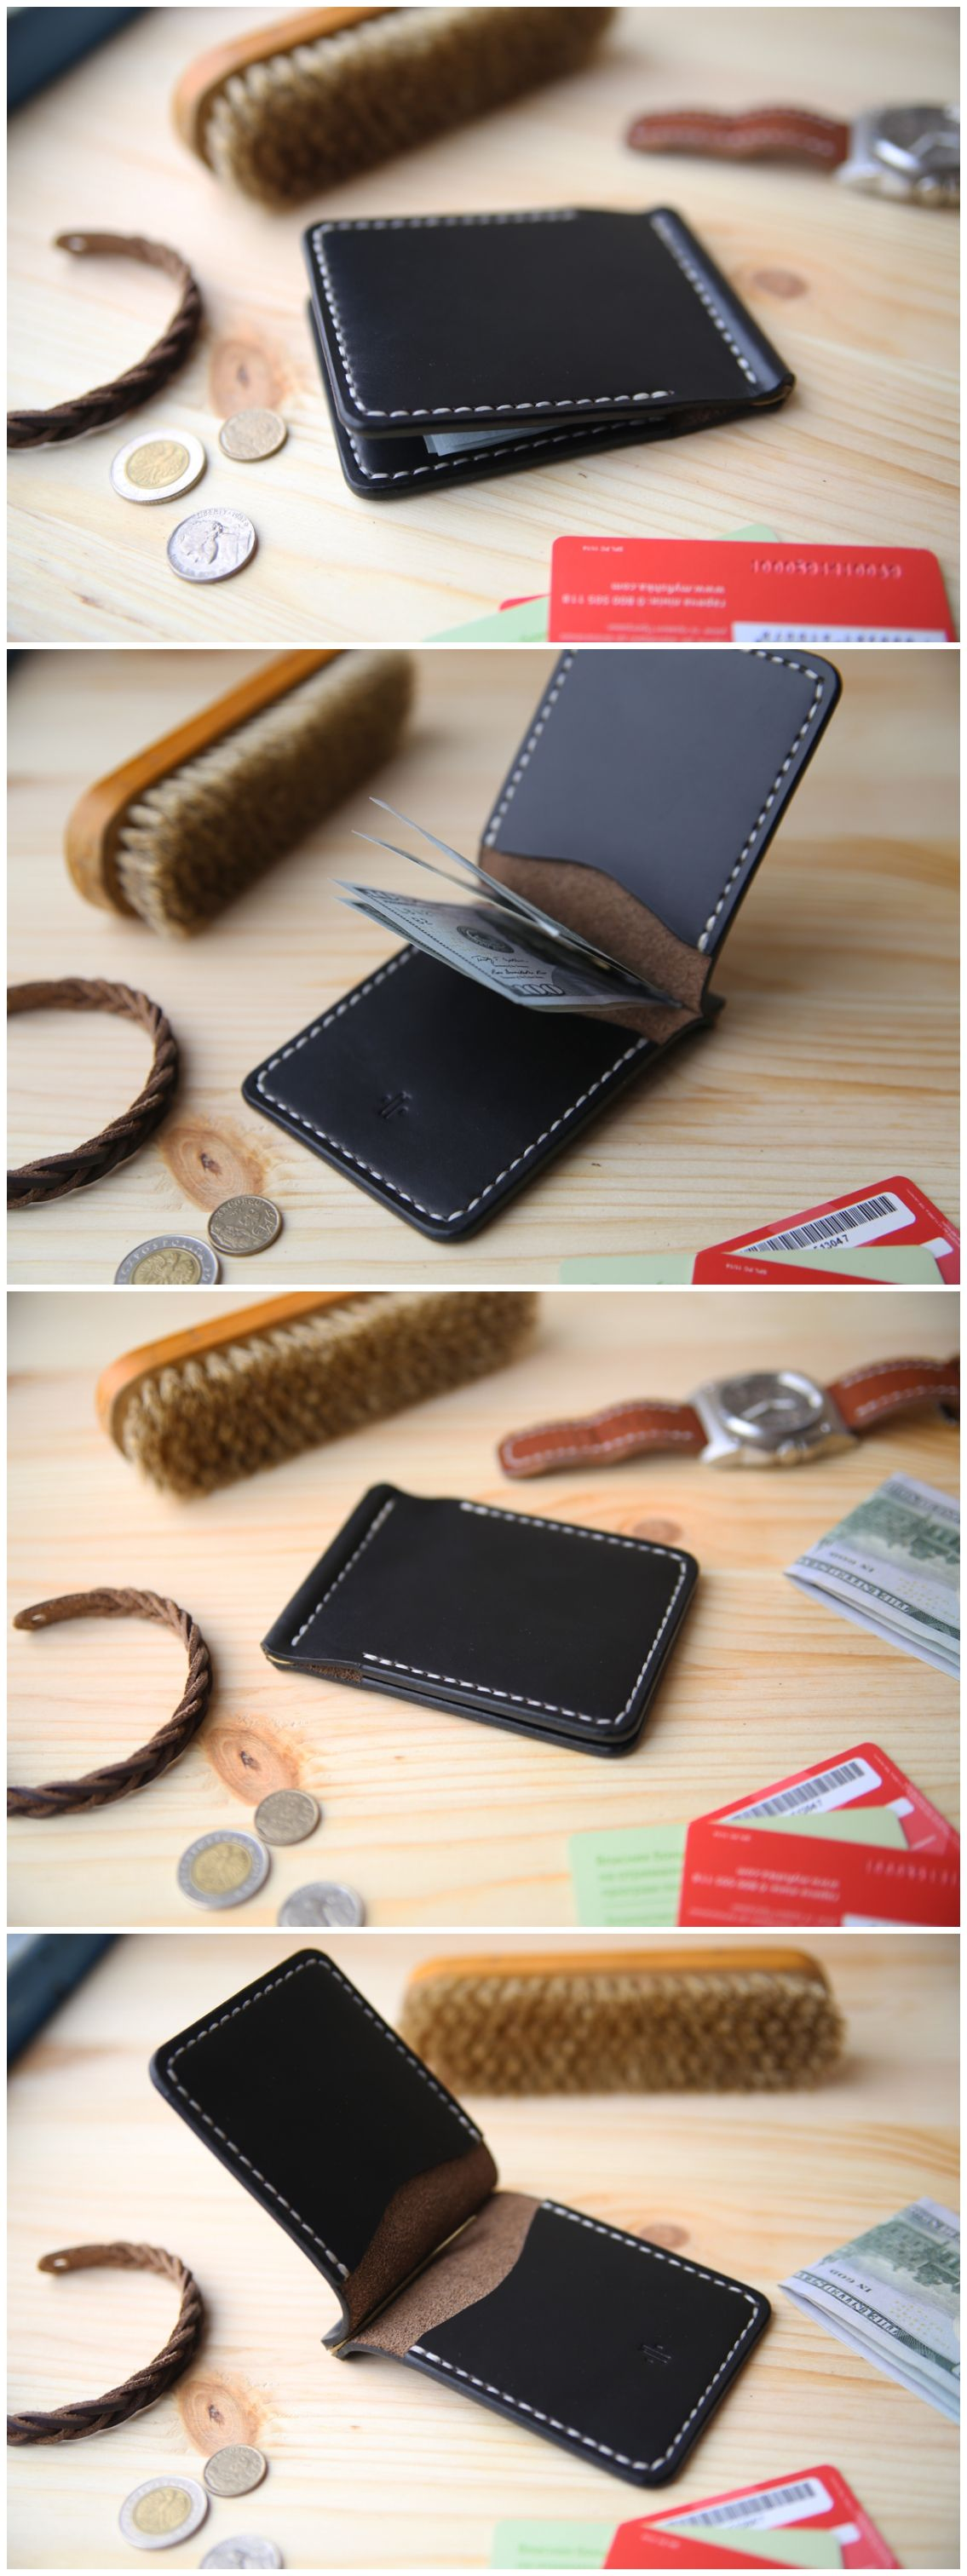 Handmade Bifold Wallet Leather Horween Black Chromexcel